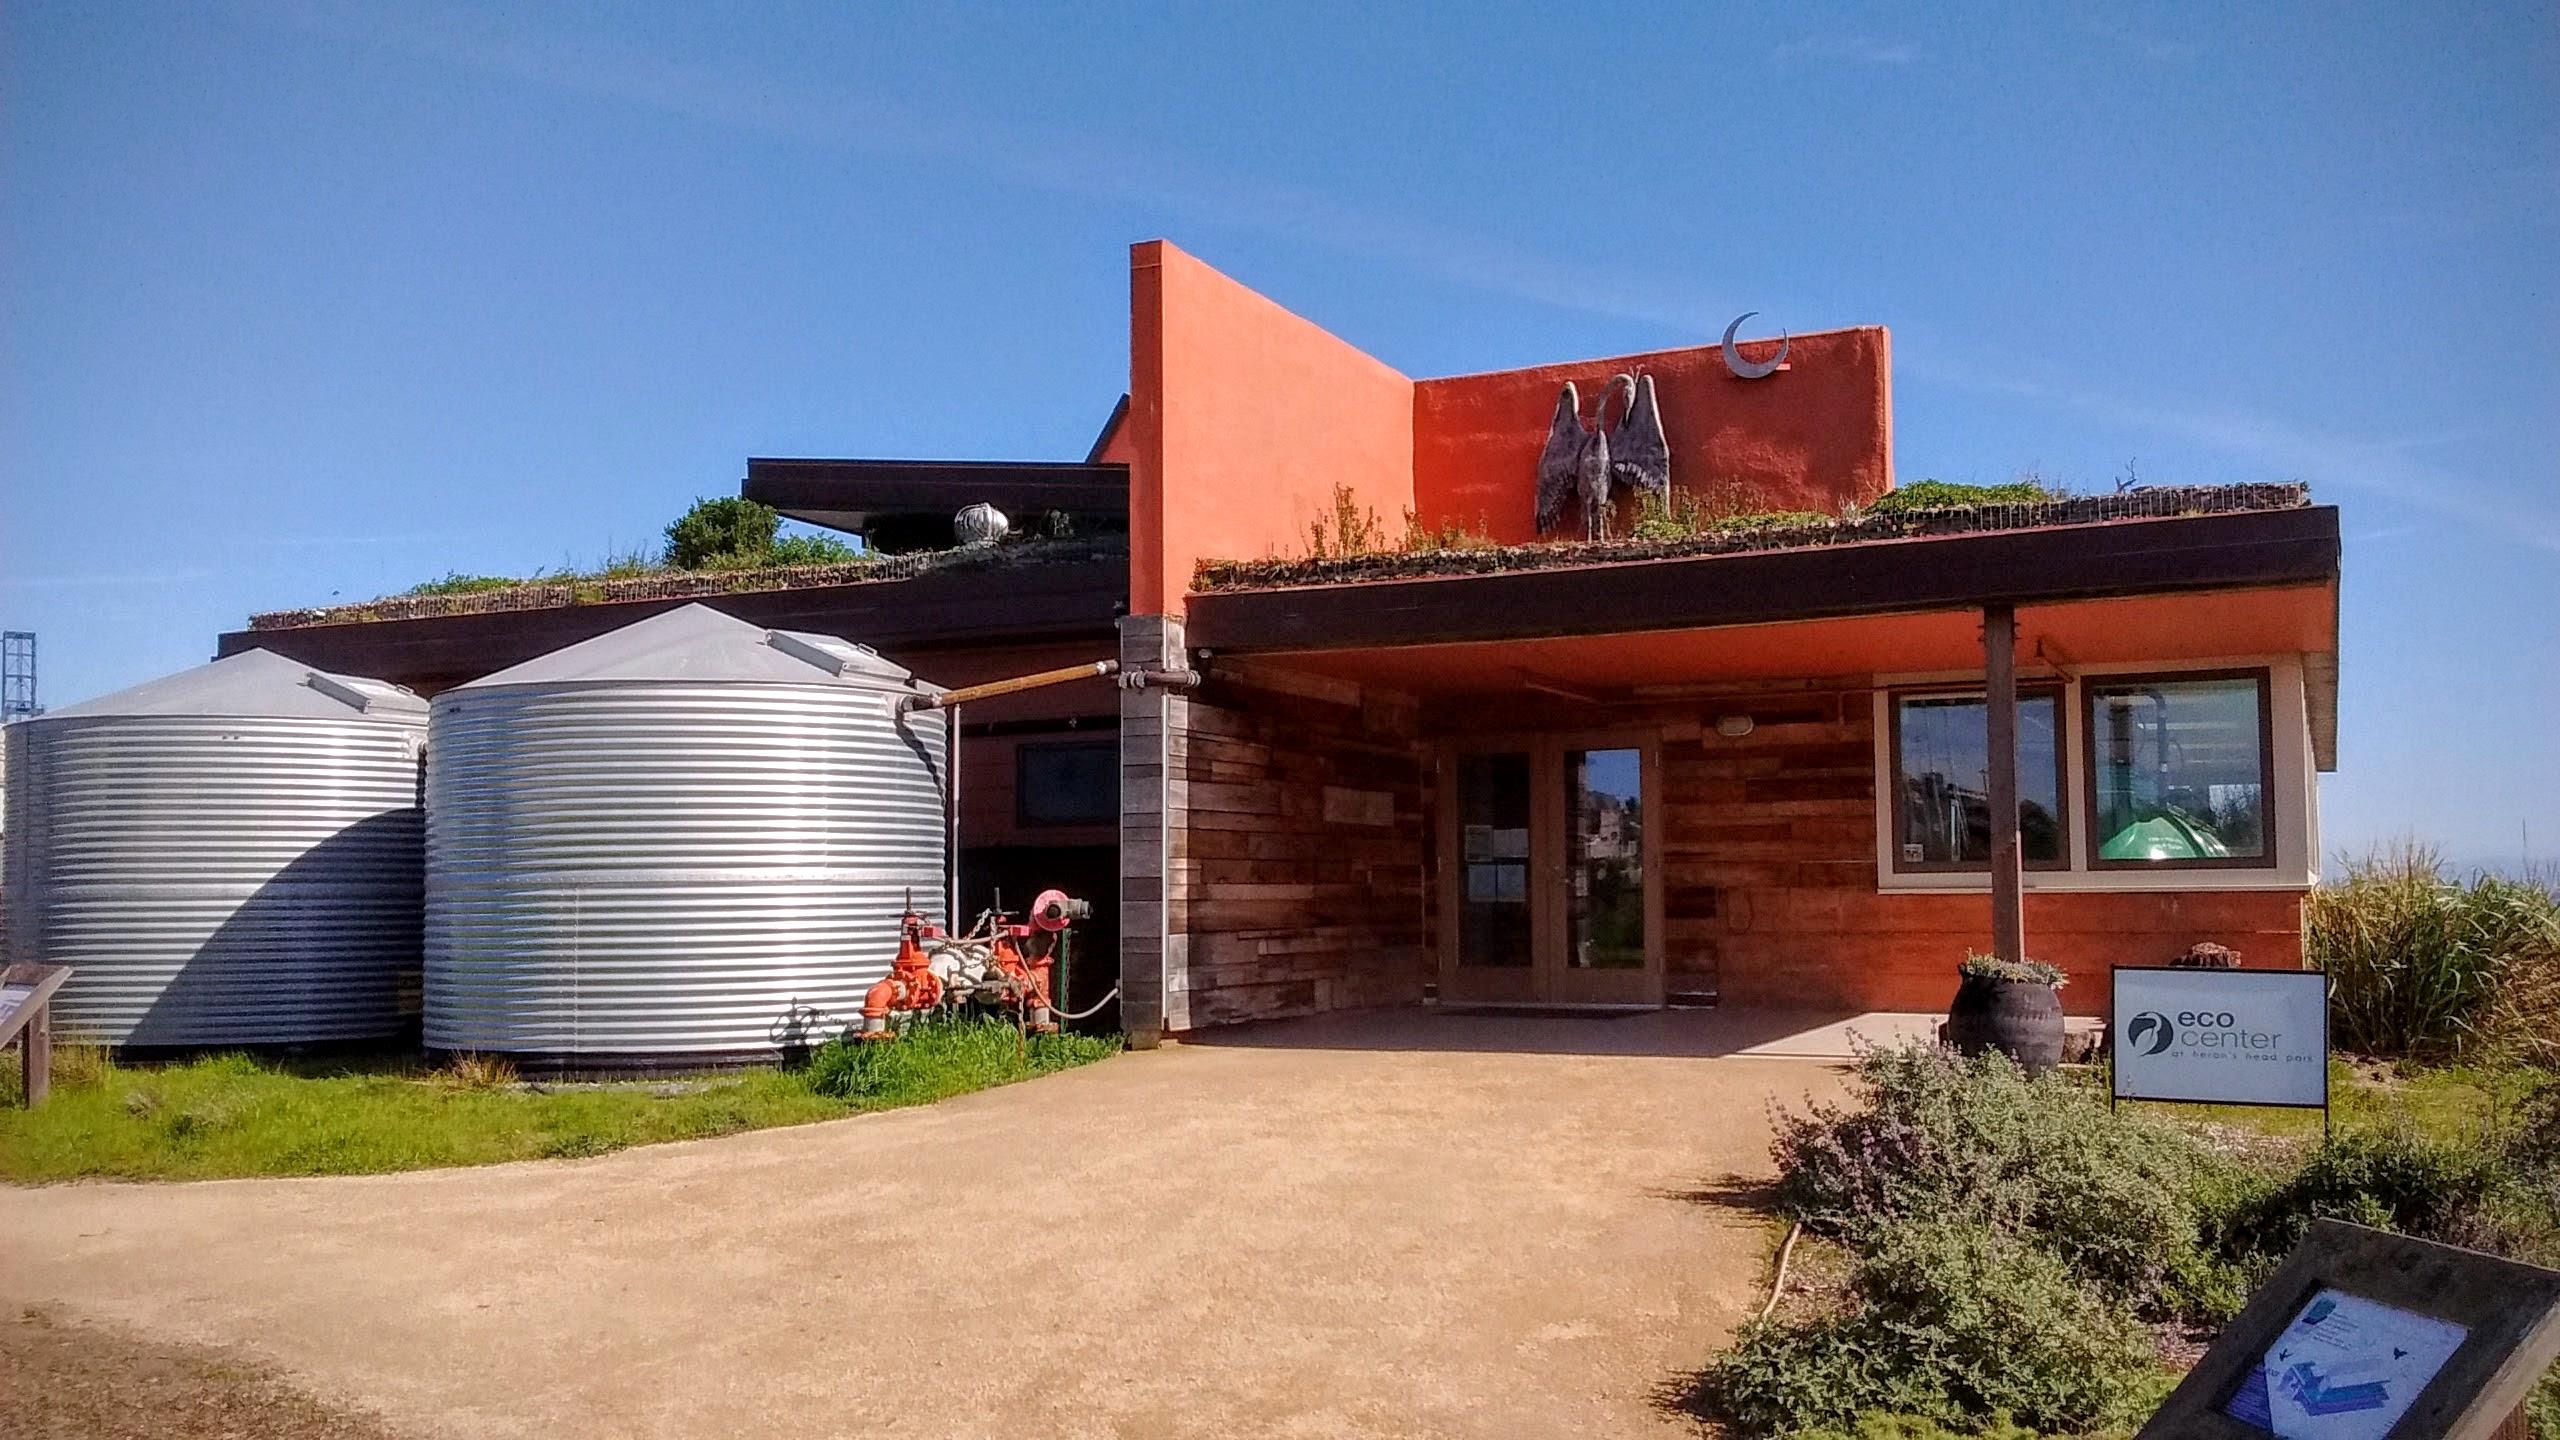 Eco Center at Heron's Head Park